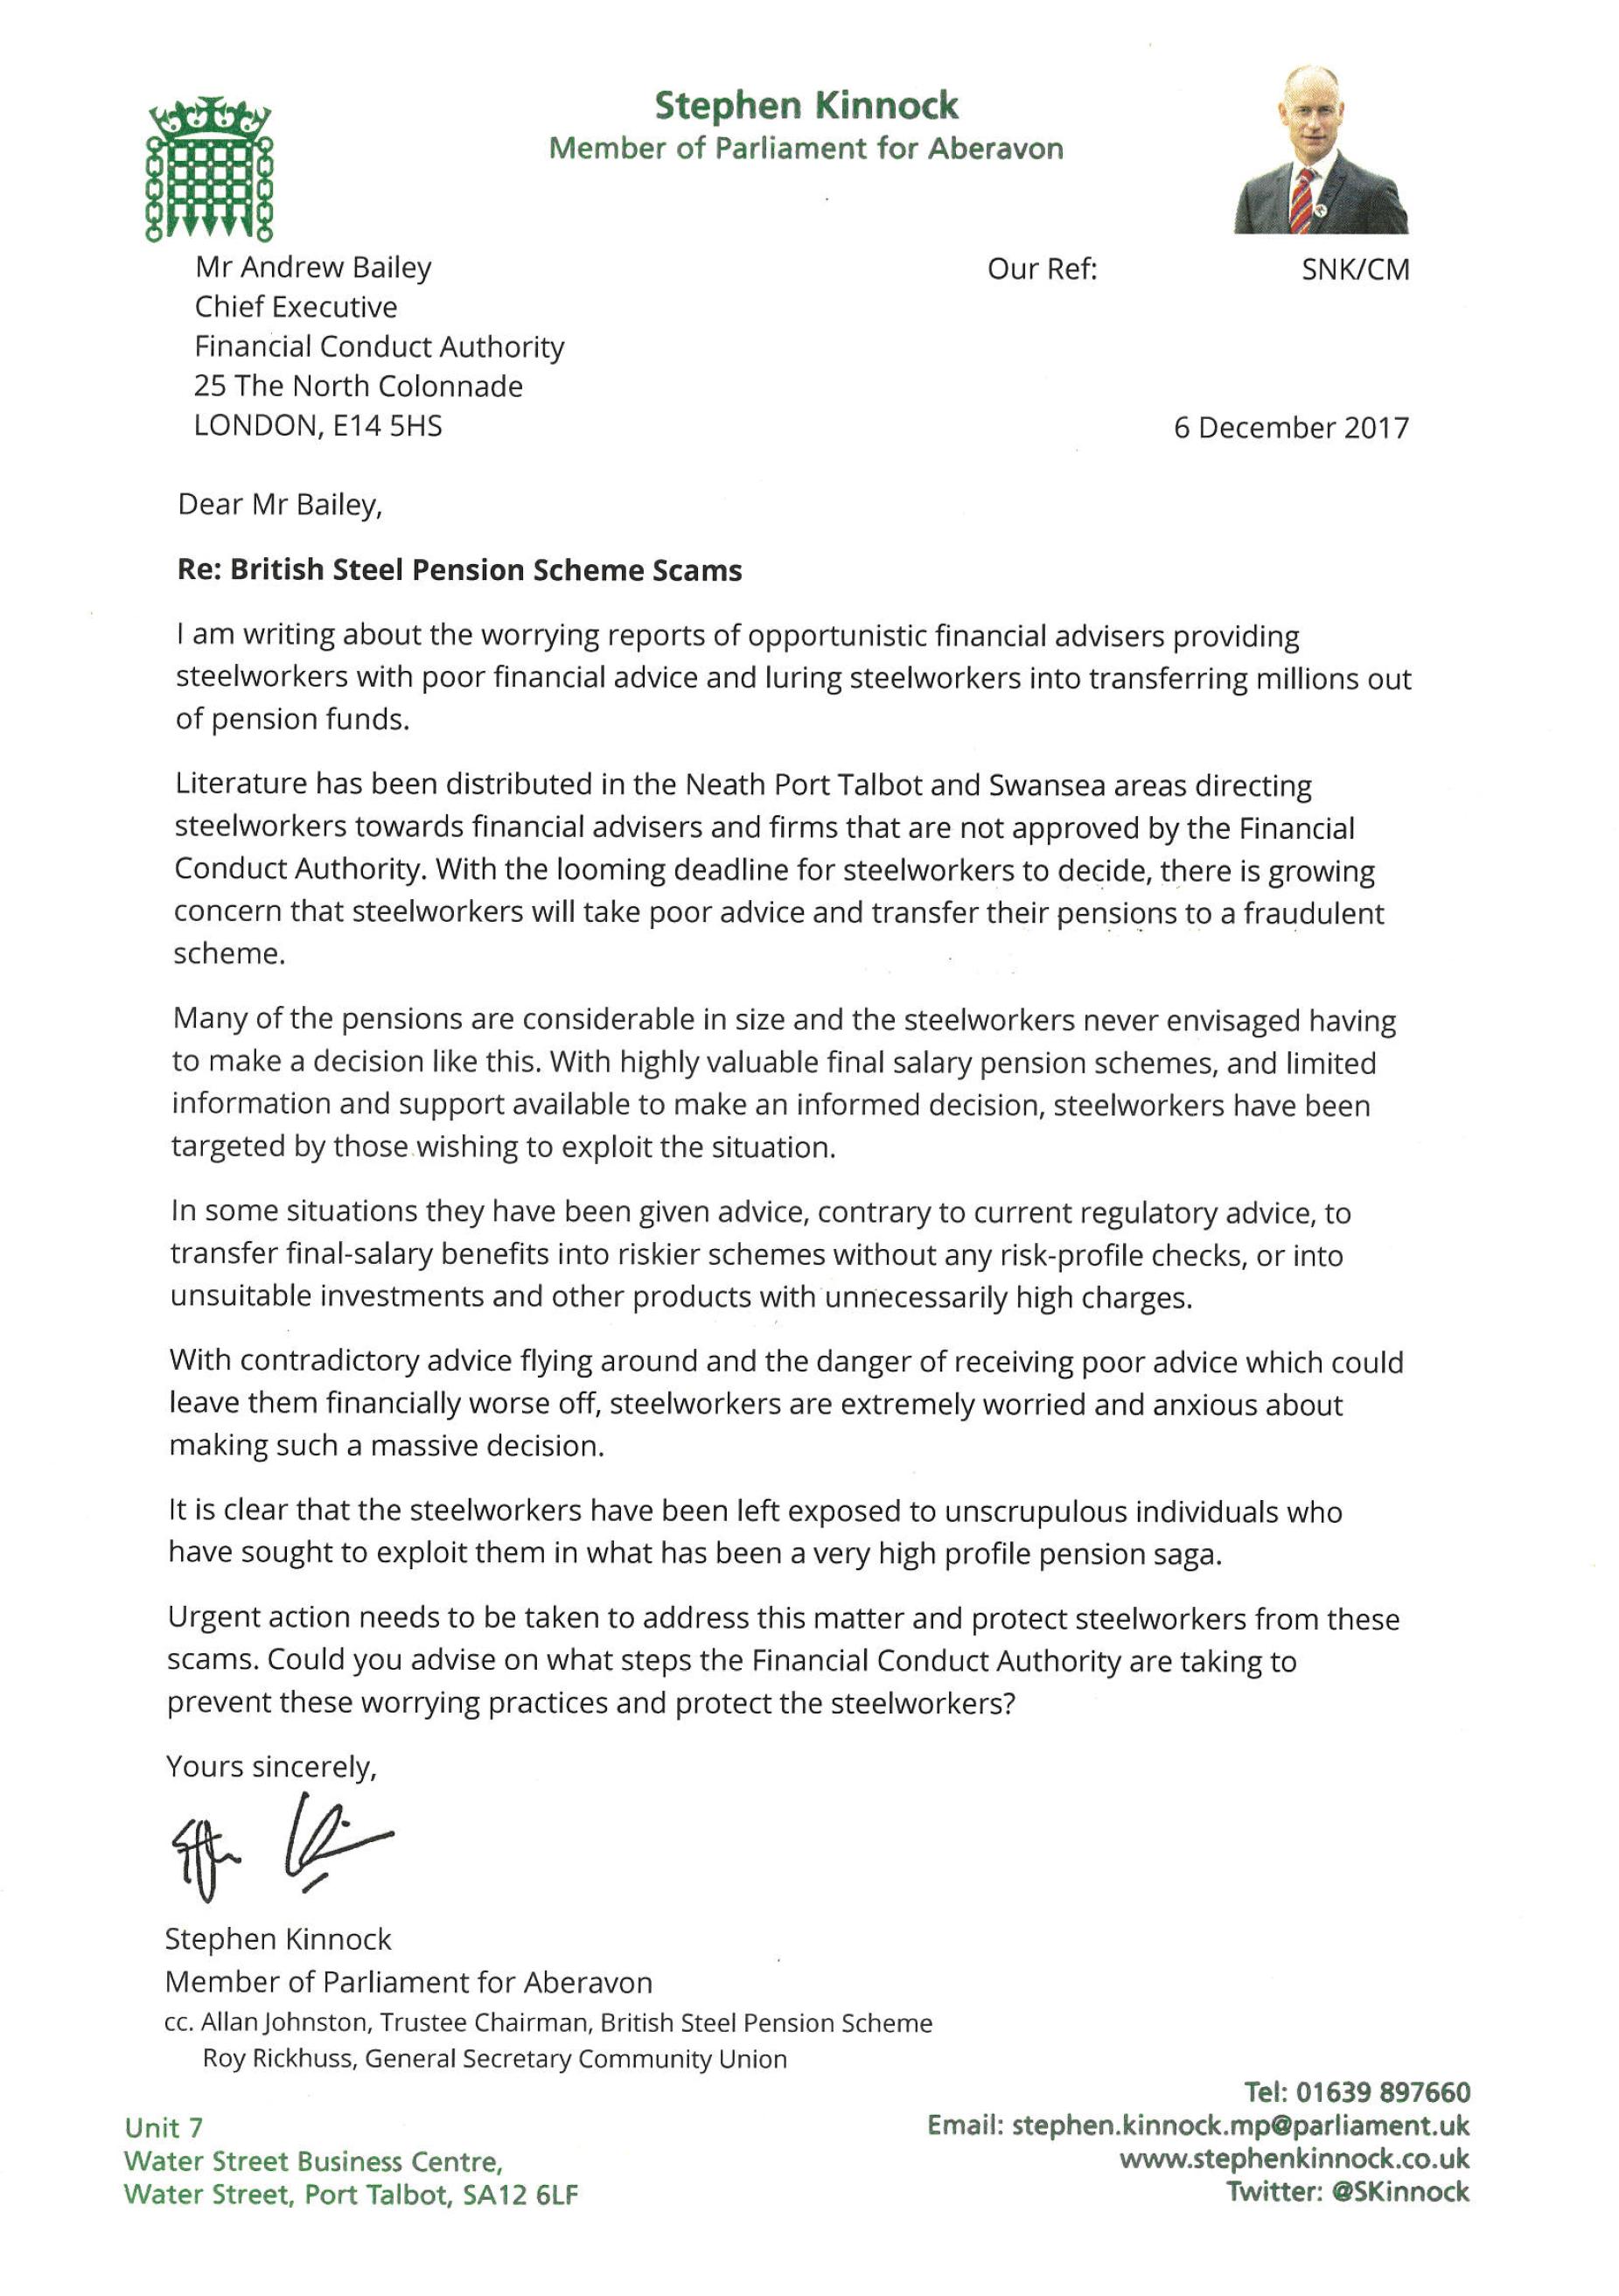 FCA_BSPS_Scam_Letter.png